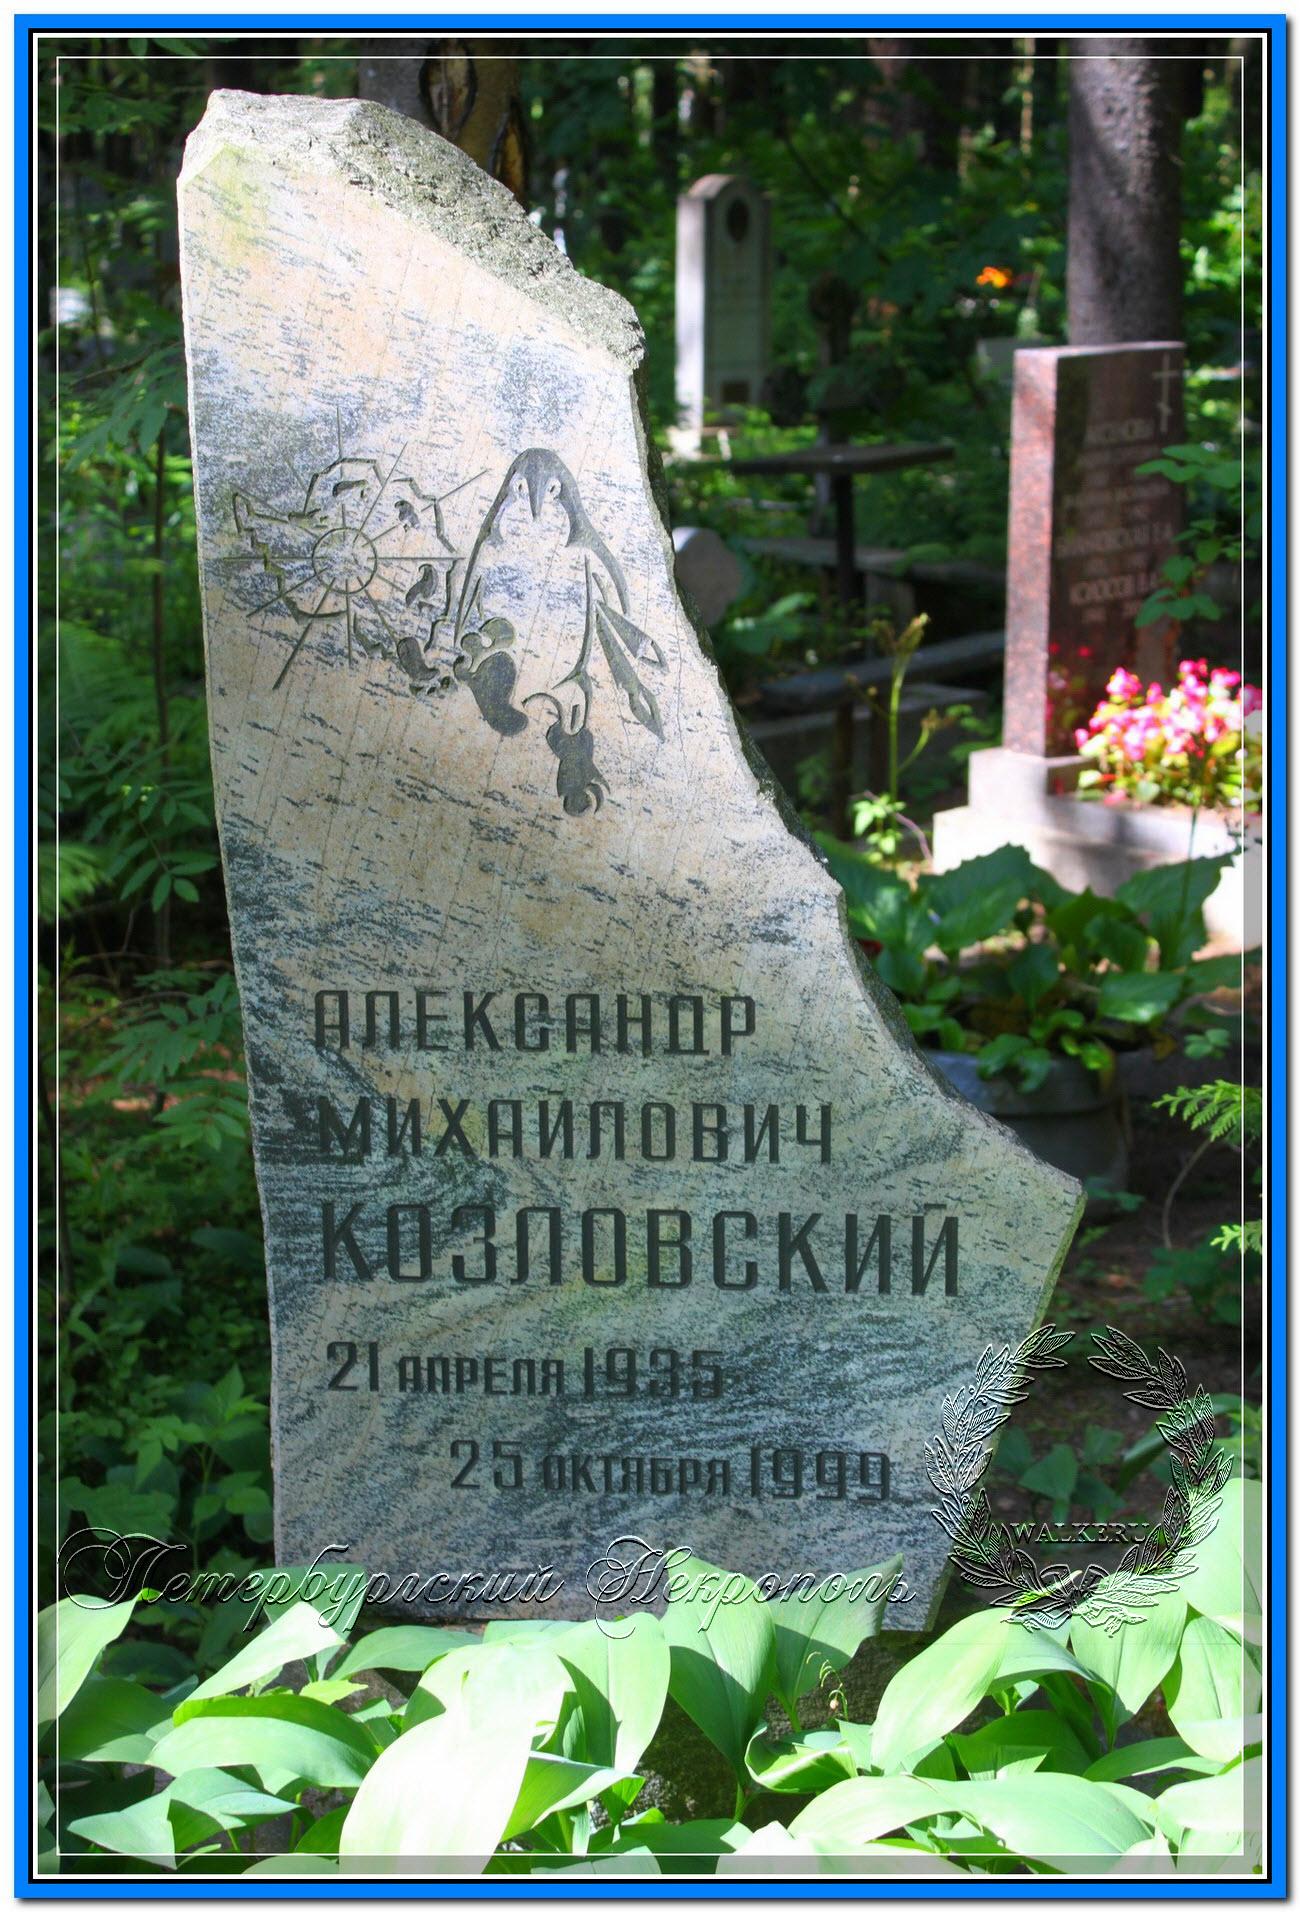 © Козловский Александр Михайлович